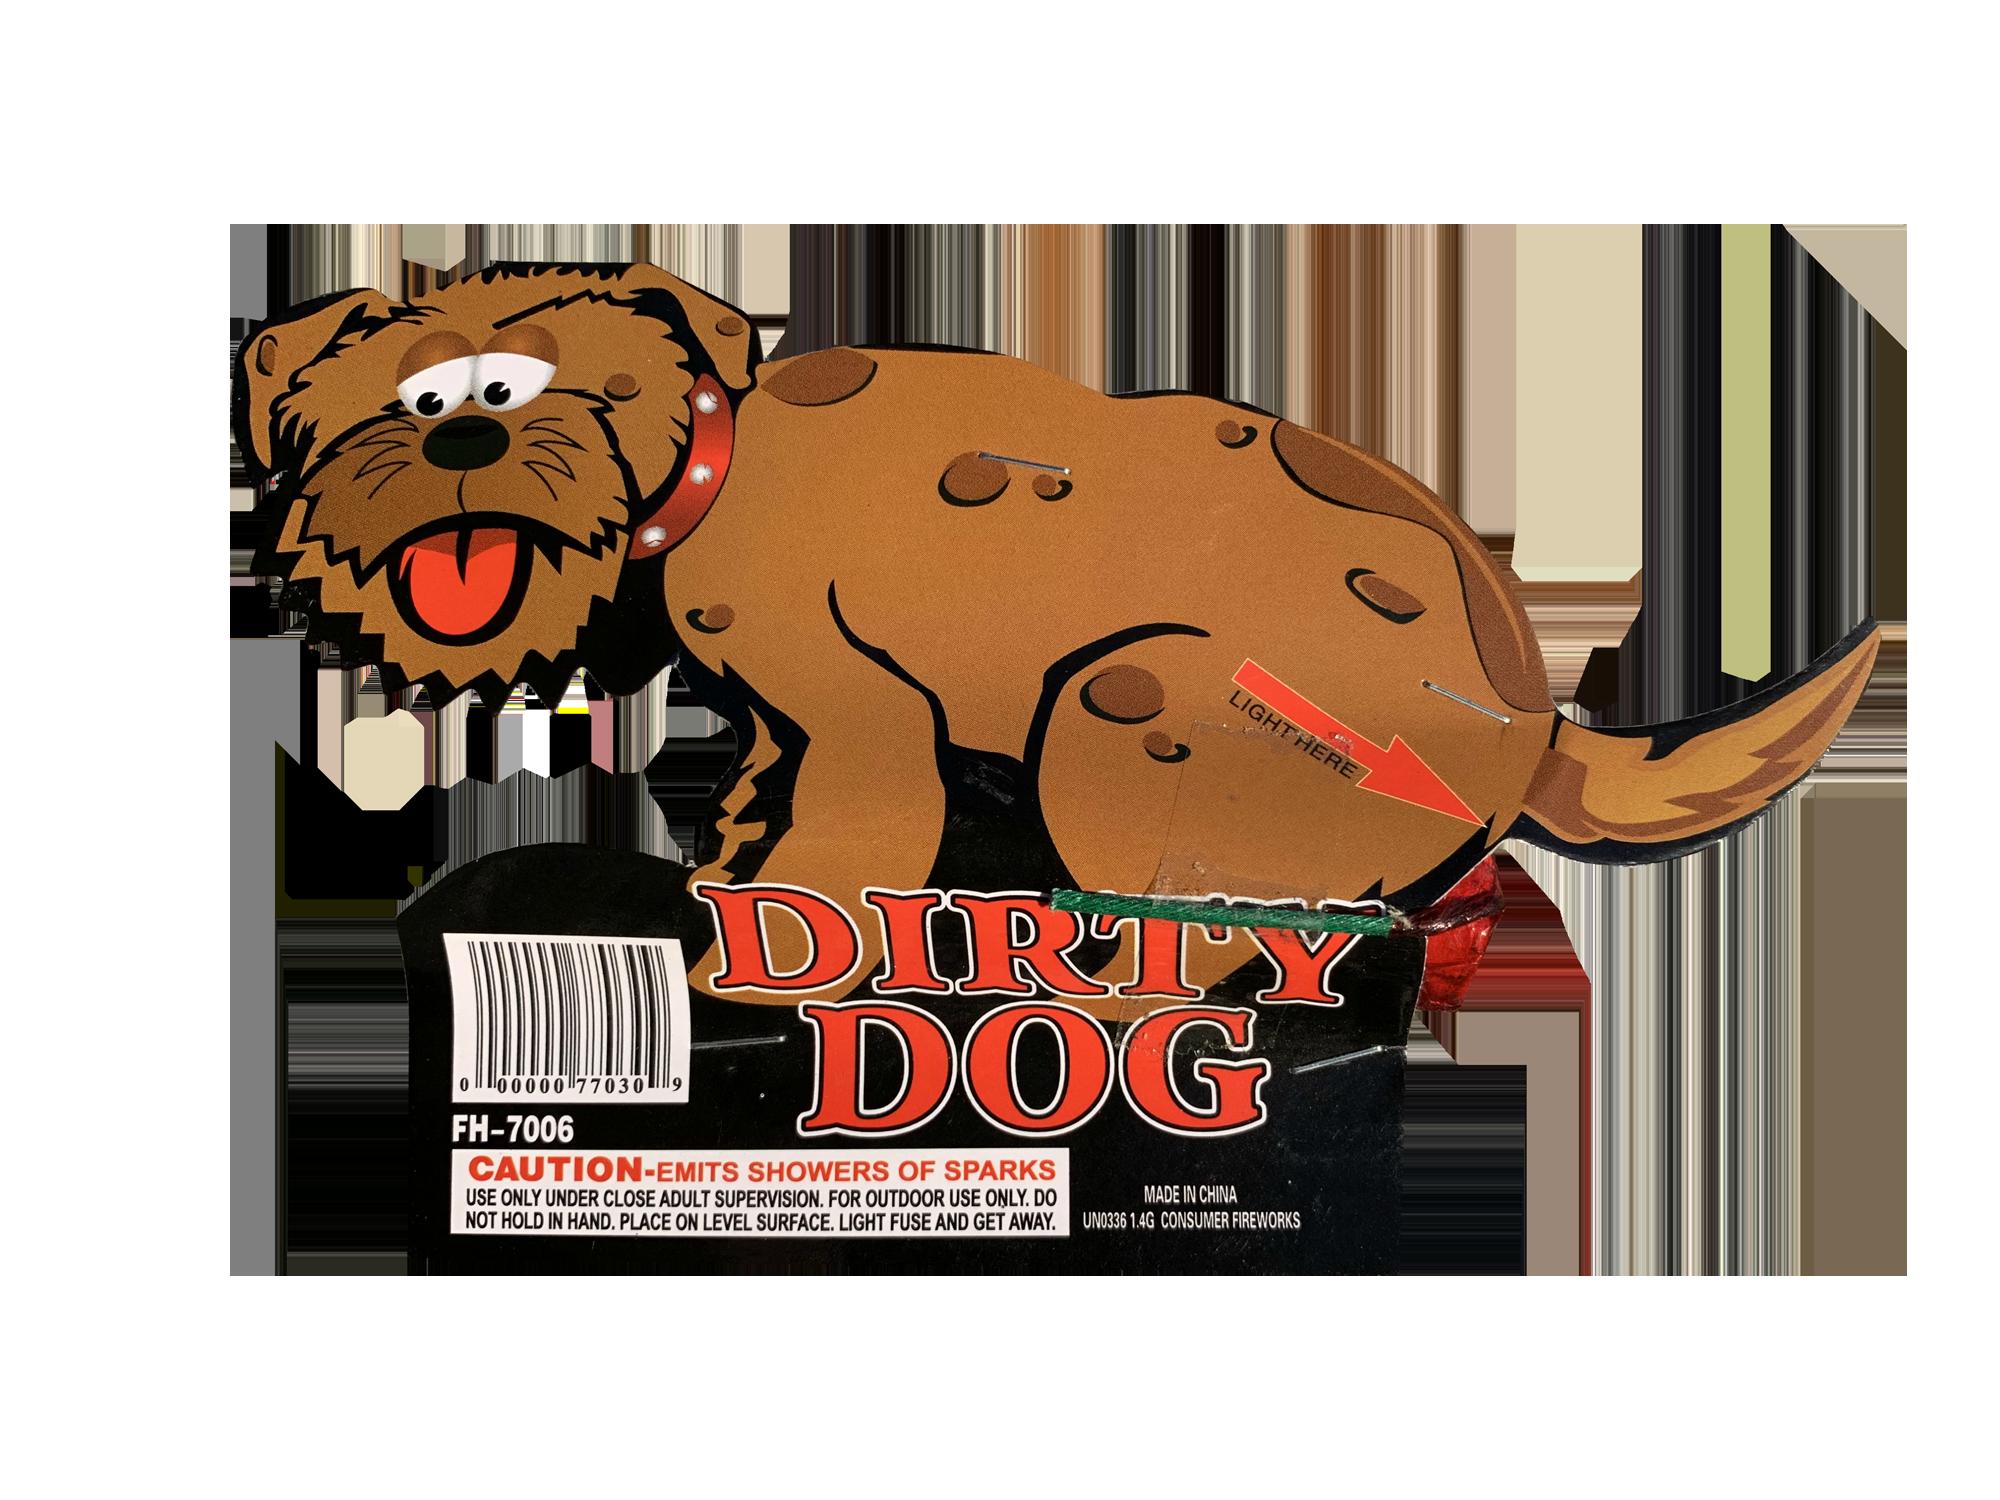 Dumpy Dog / Naughty Dog